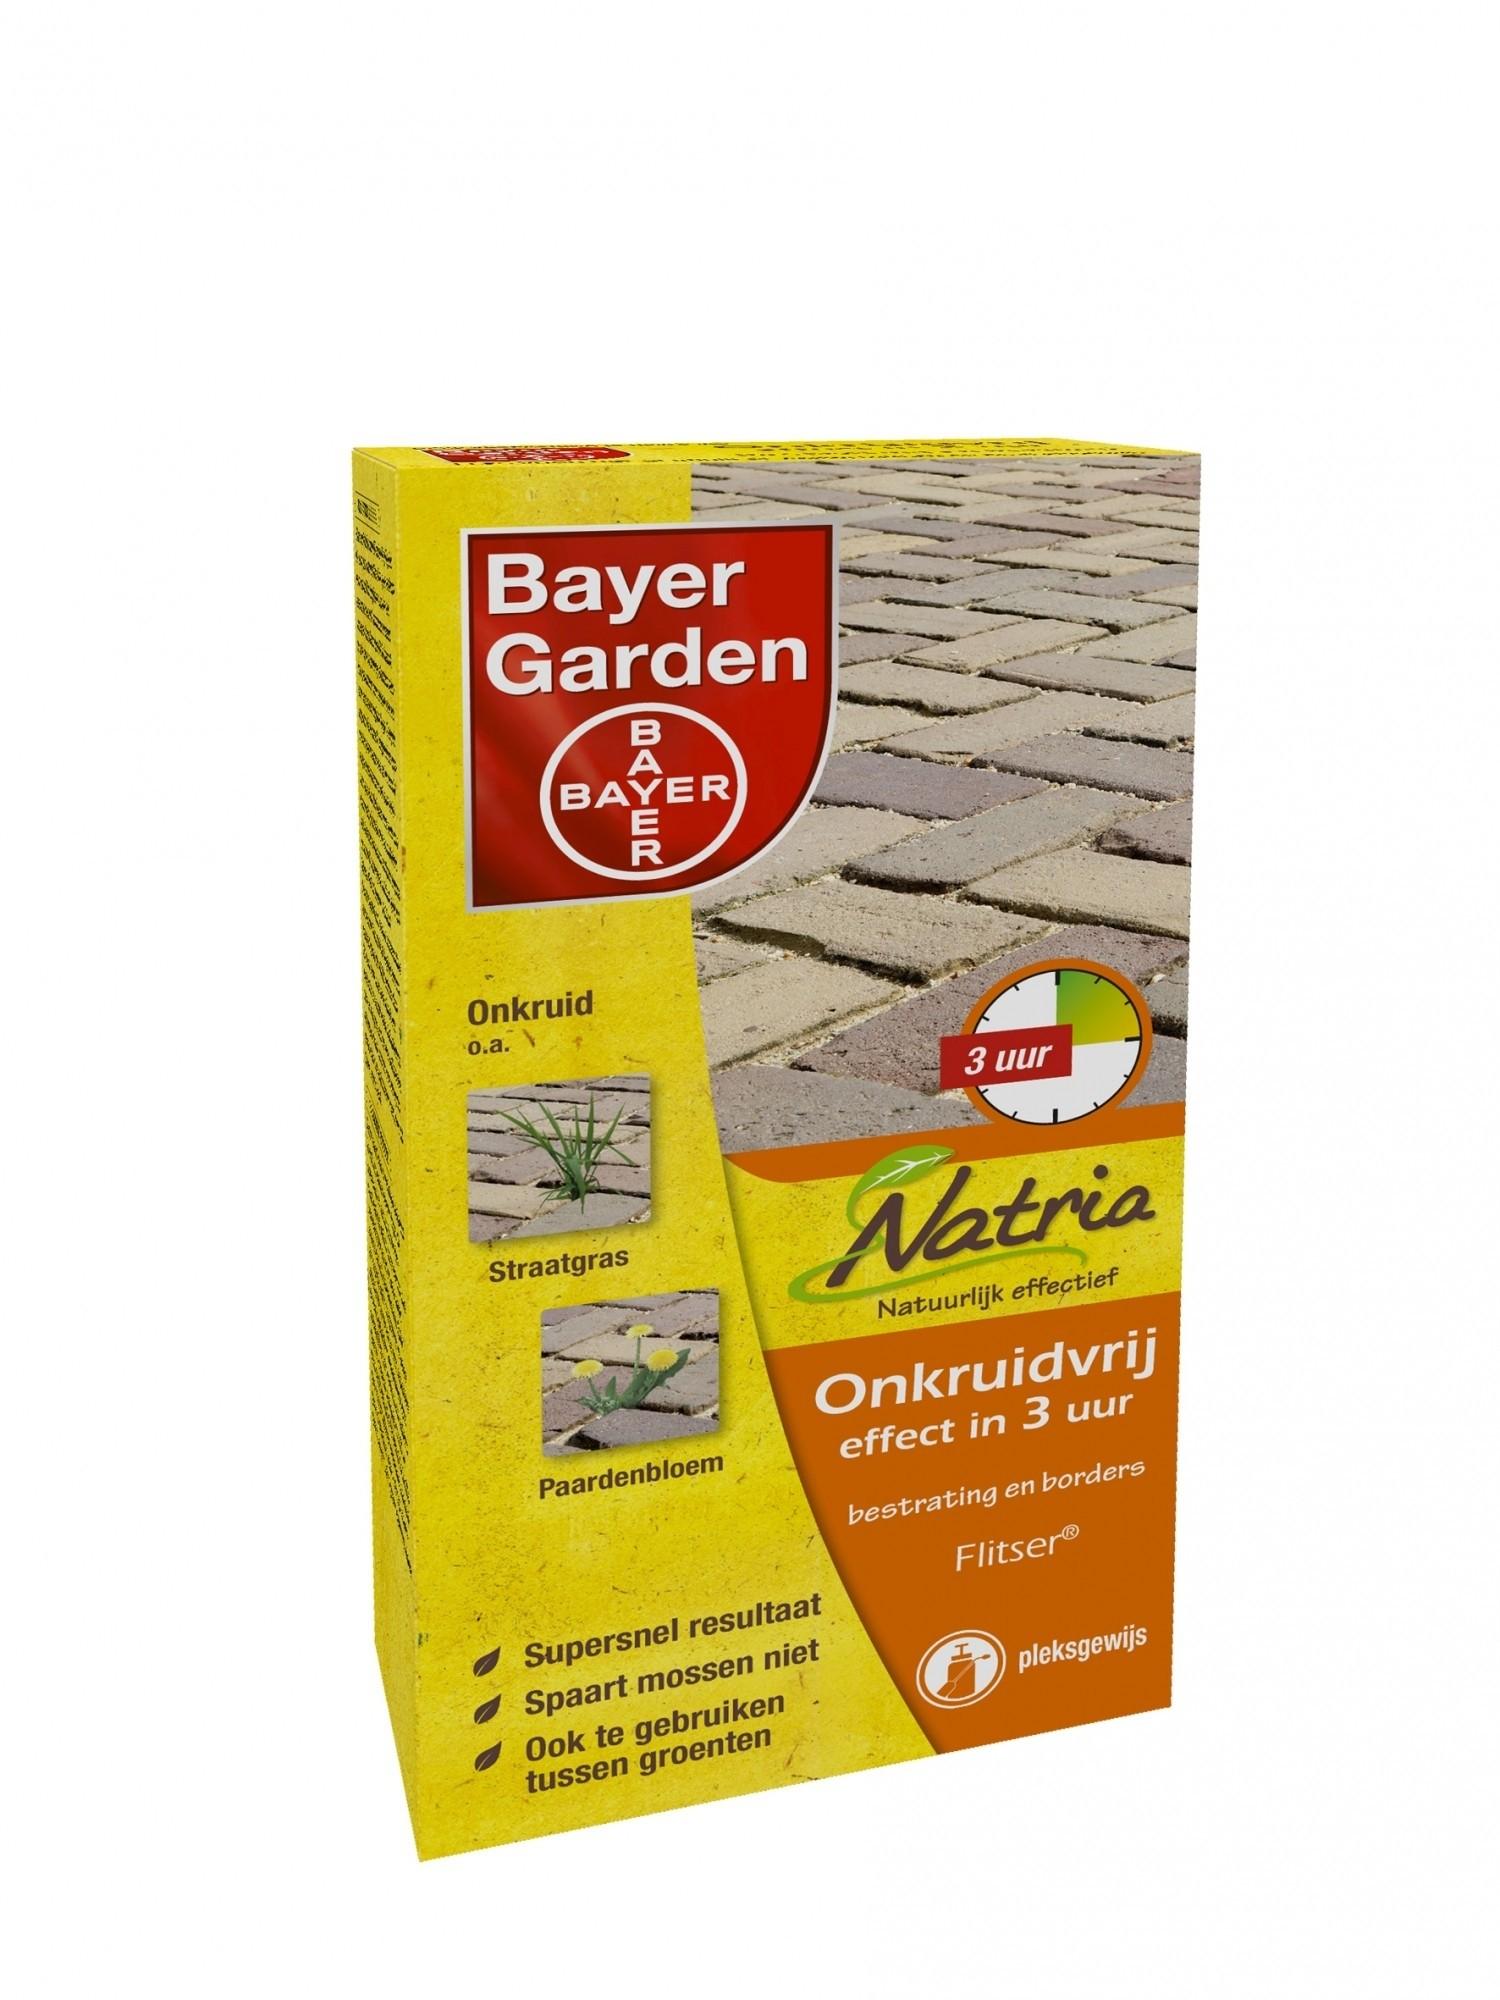 Flitser concentraat tegen onkruid 510ml